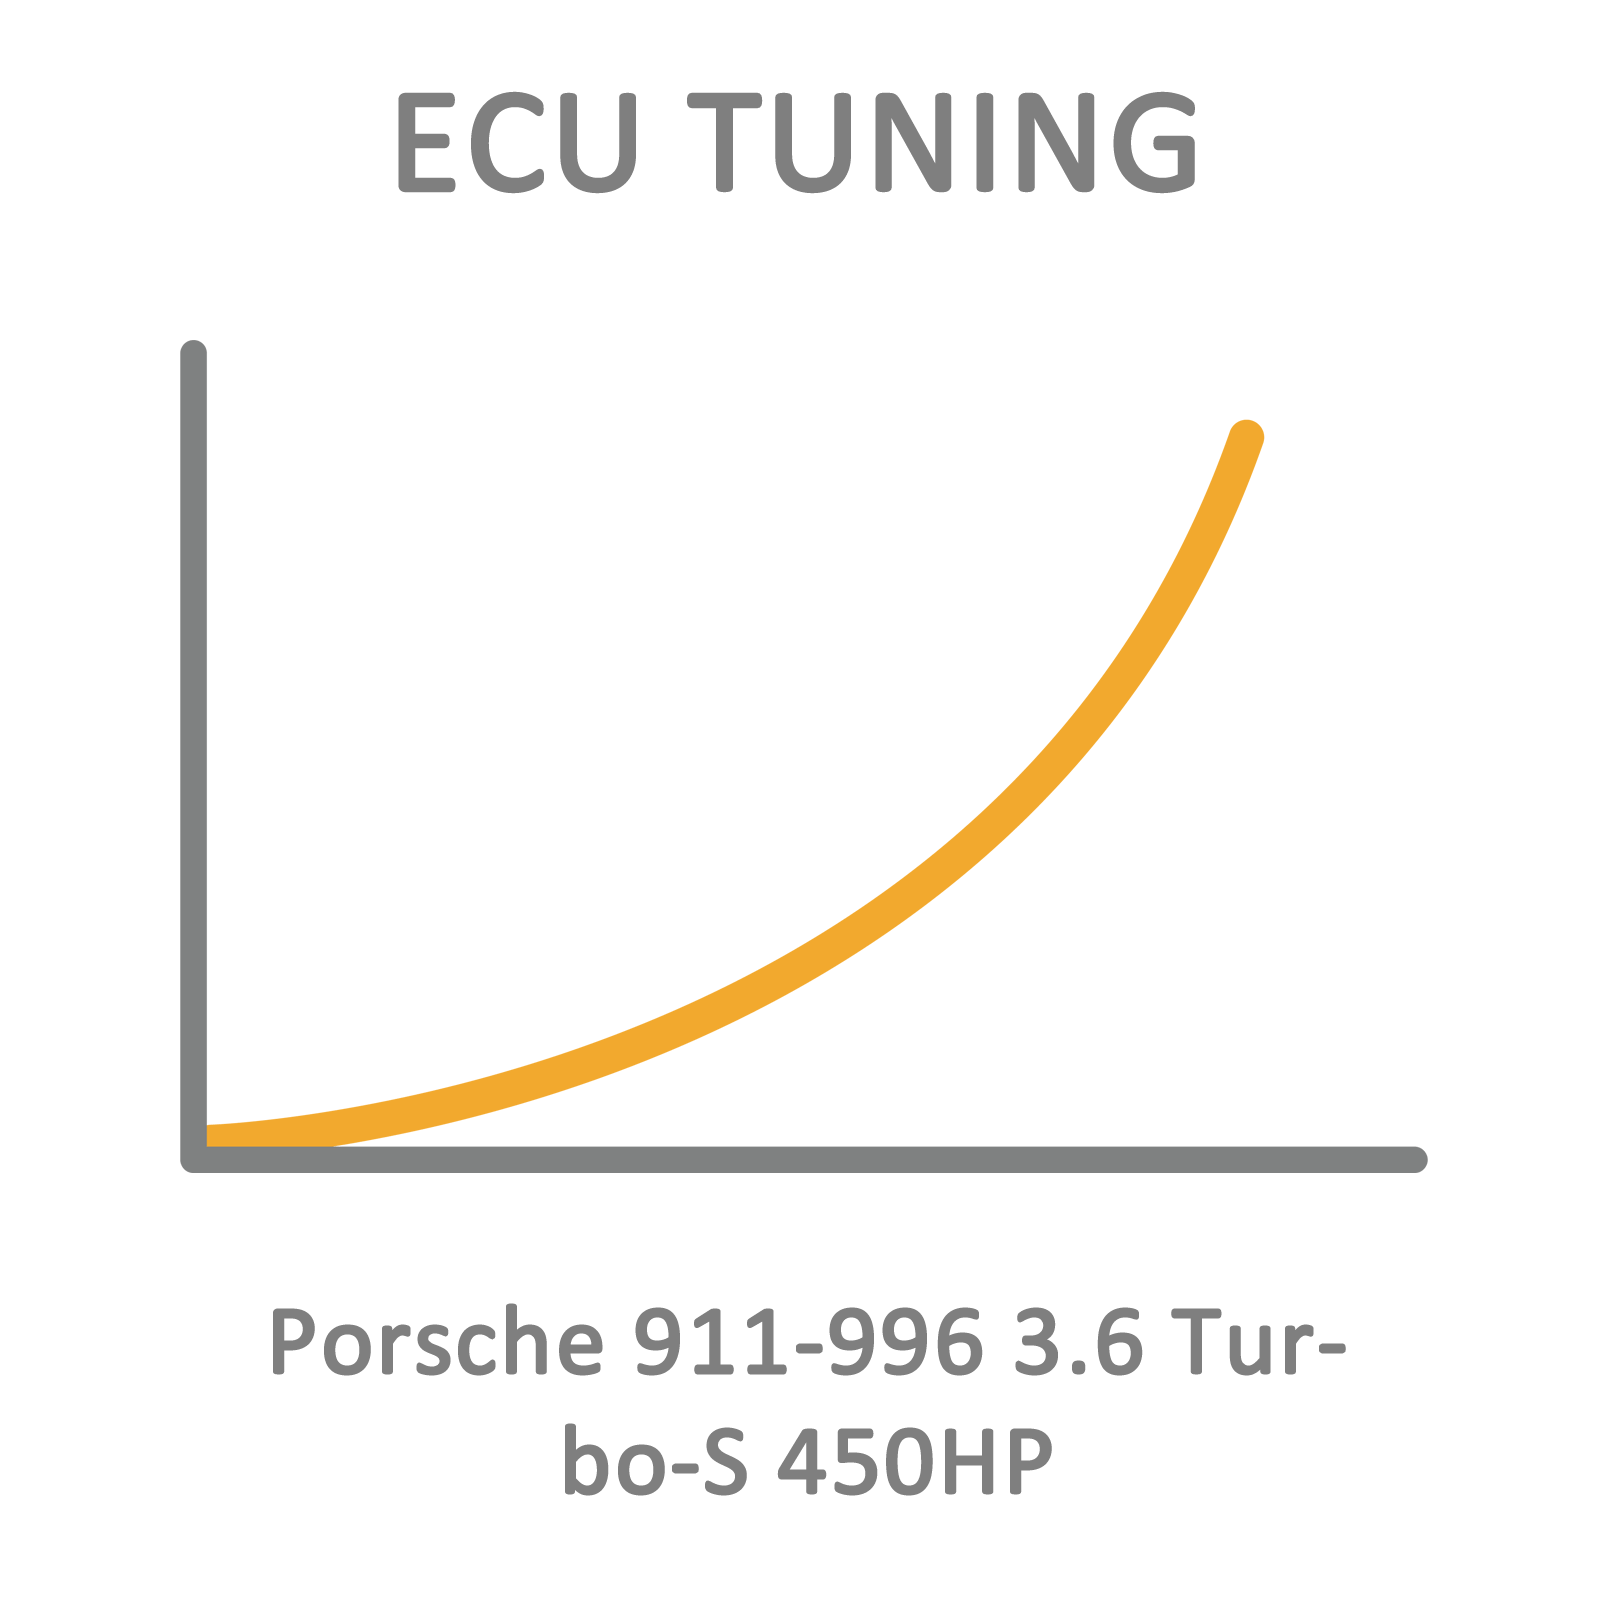 Porsche 911-996 3.6 Turbo-S 450HP ECU Tuning Remapping